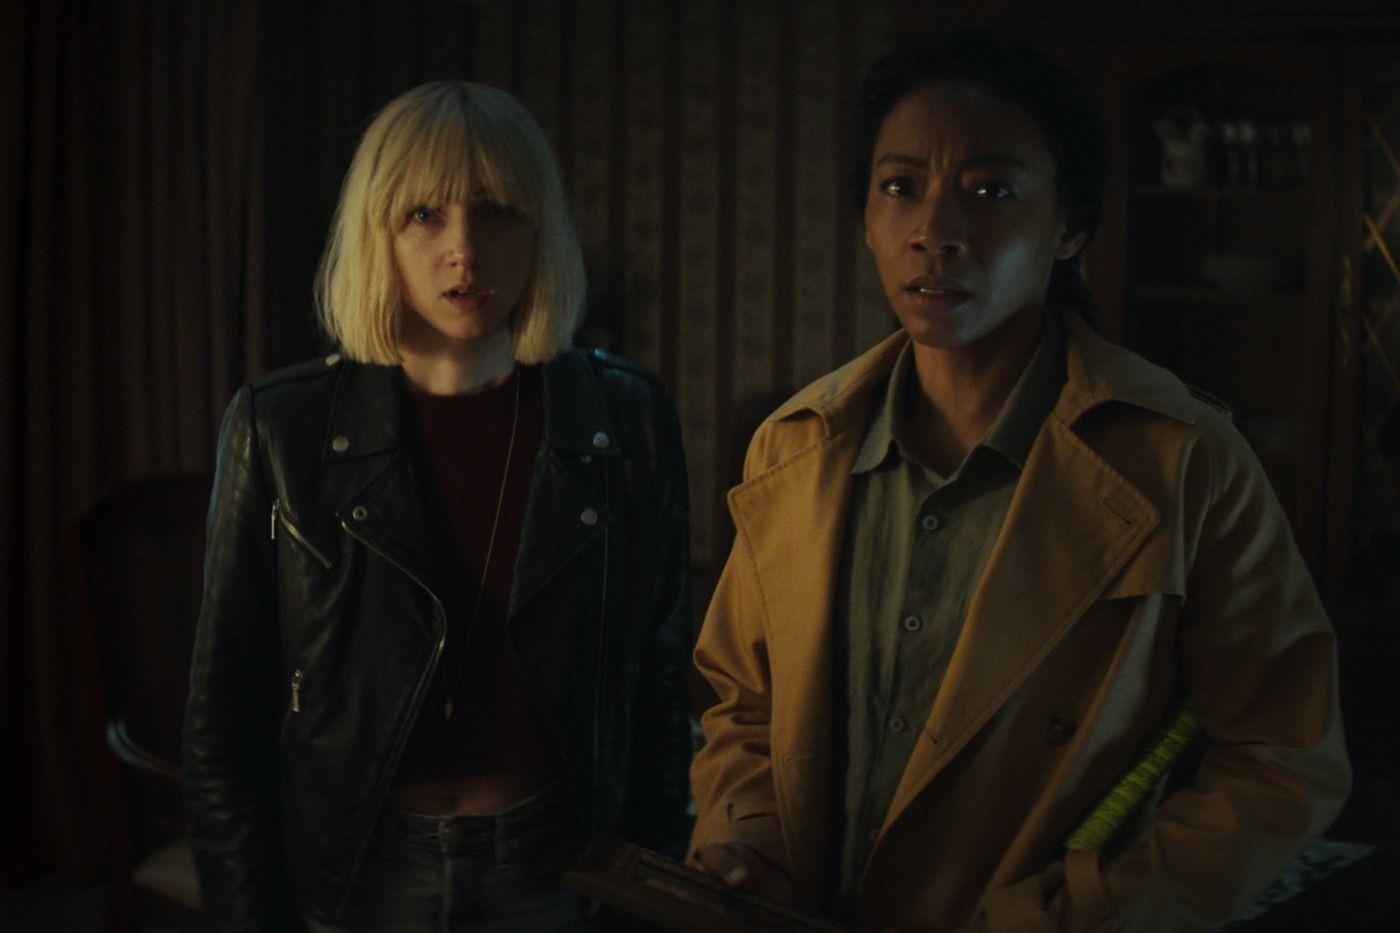 Clickbait Trailer Reveals the Dark Side of Social Media in Adrian Grenier's Netflix Miniseries